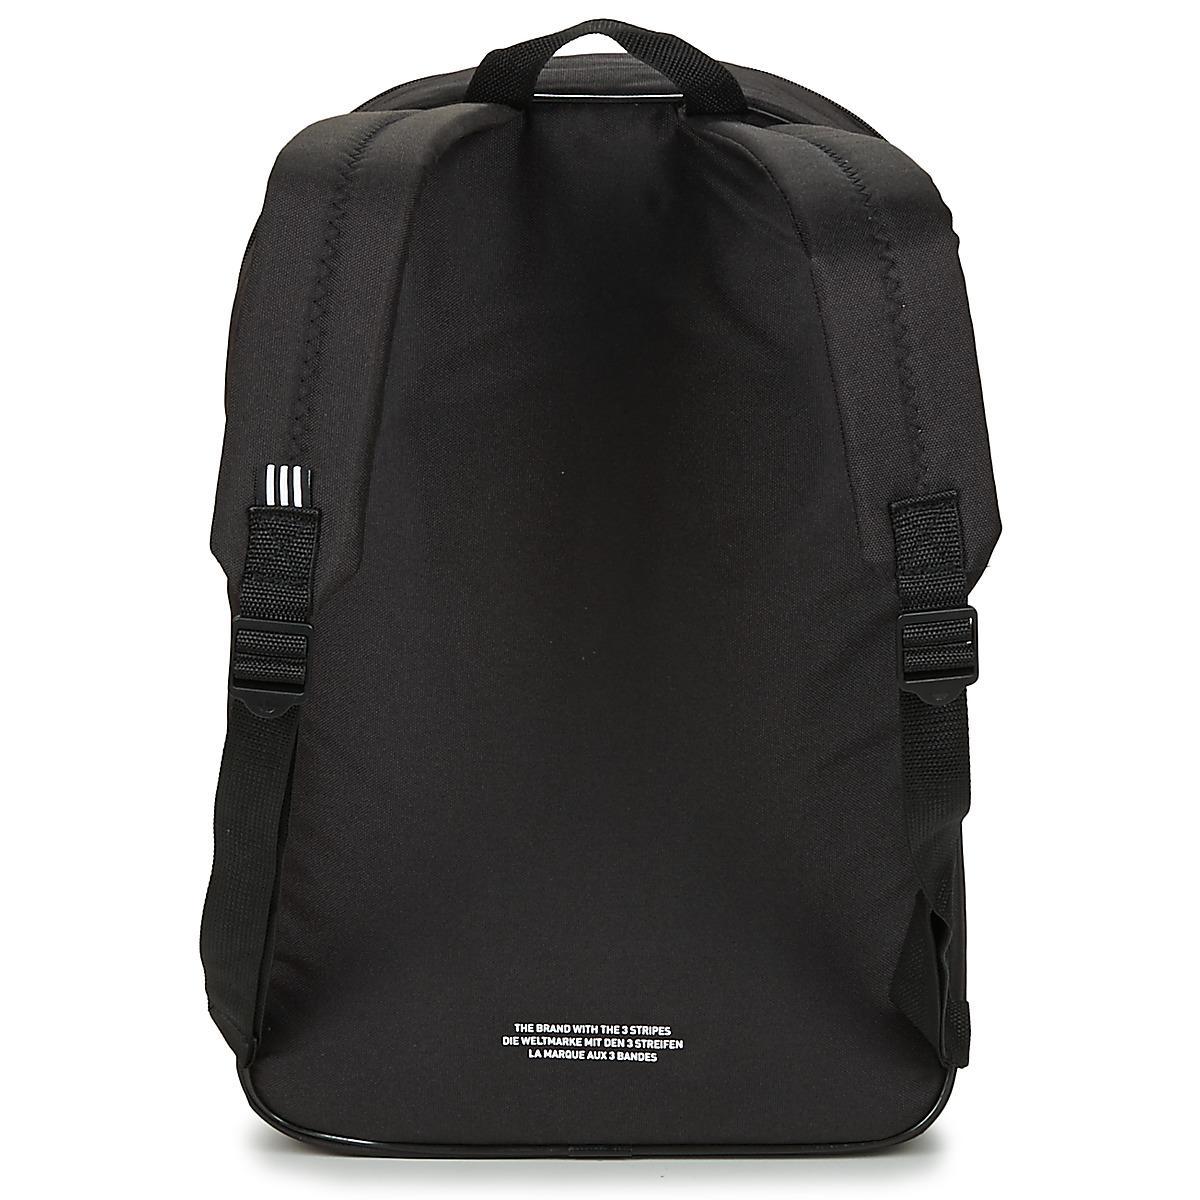 66f73015463c Adidas - Bp Clas Trefoil Men s Backpack In Black for Men - Lyst. View  fullscreen